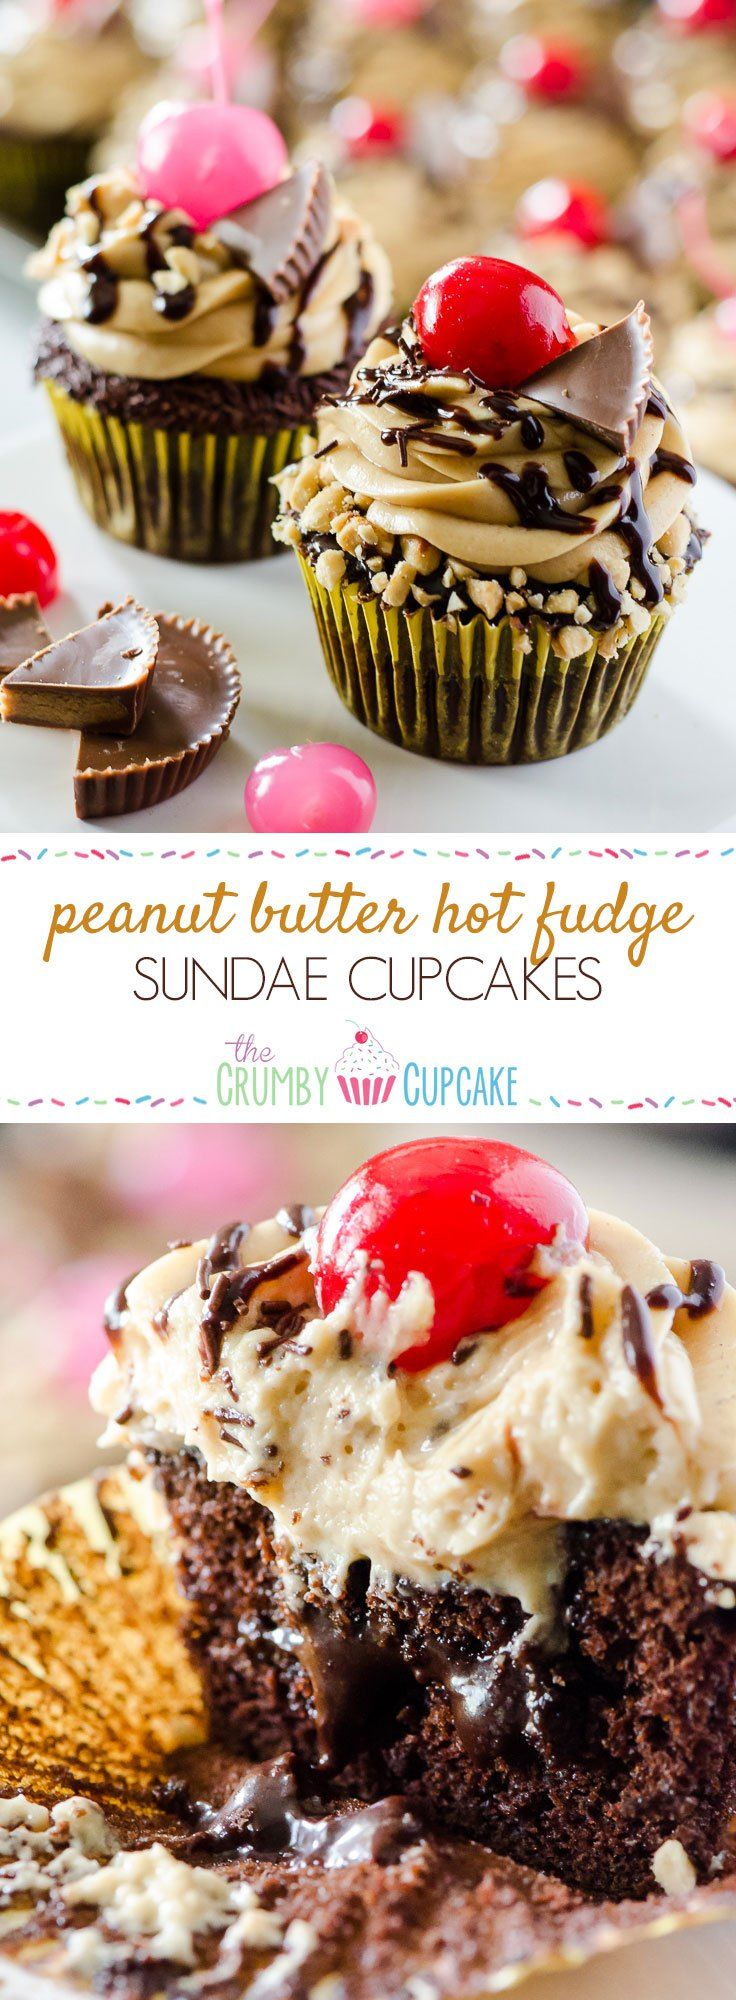 Peanut Butter Hot Fudge Sundae Cupcakes